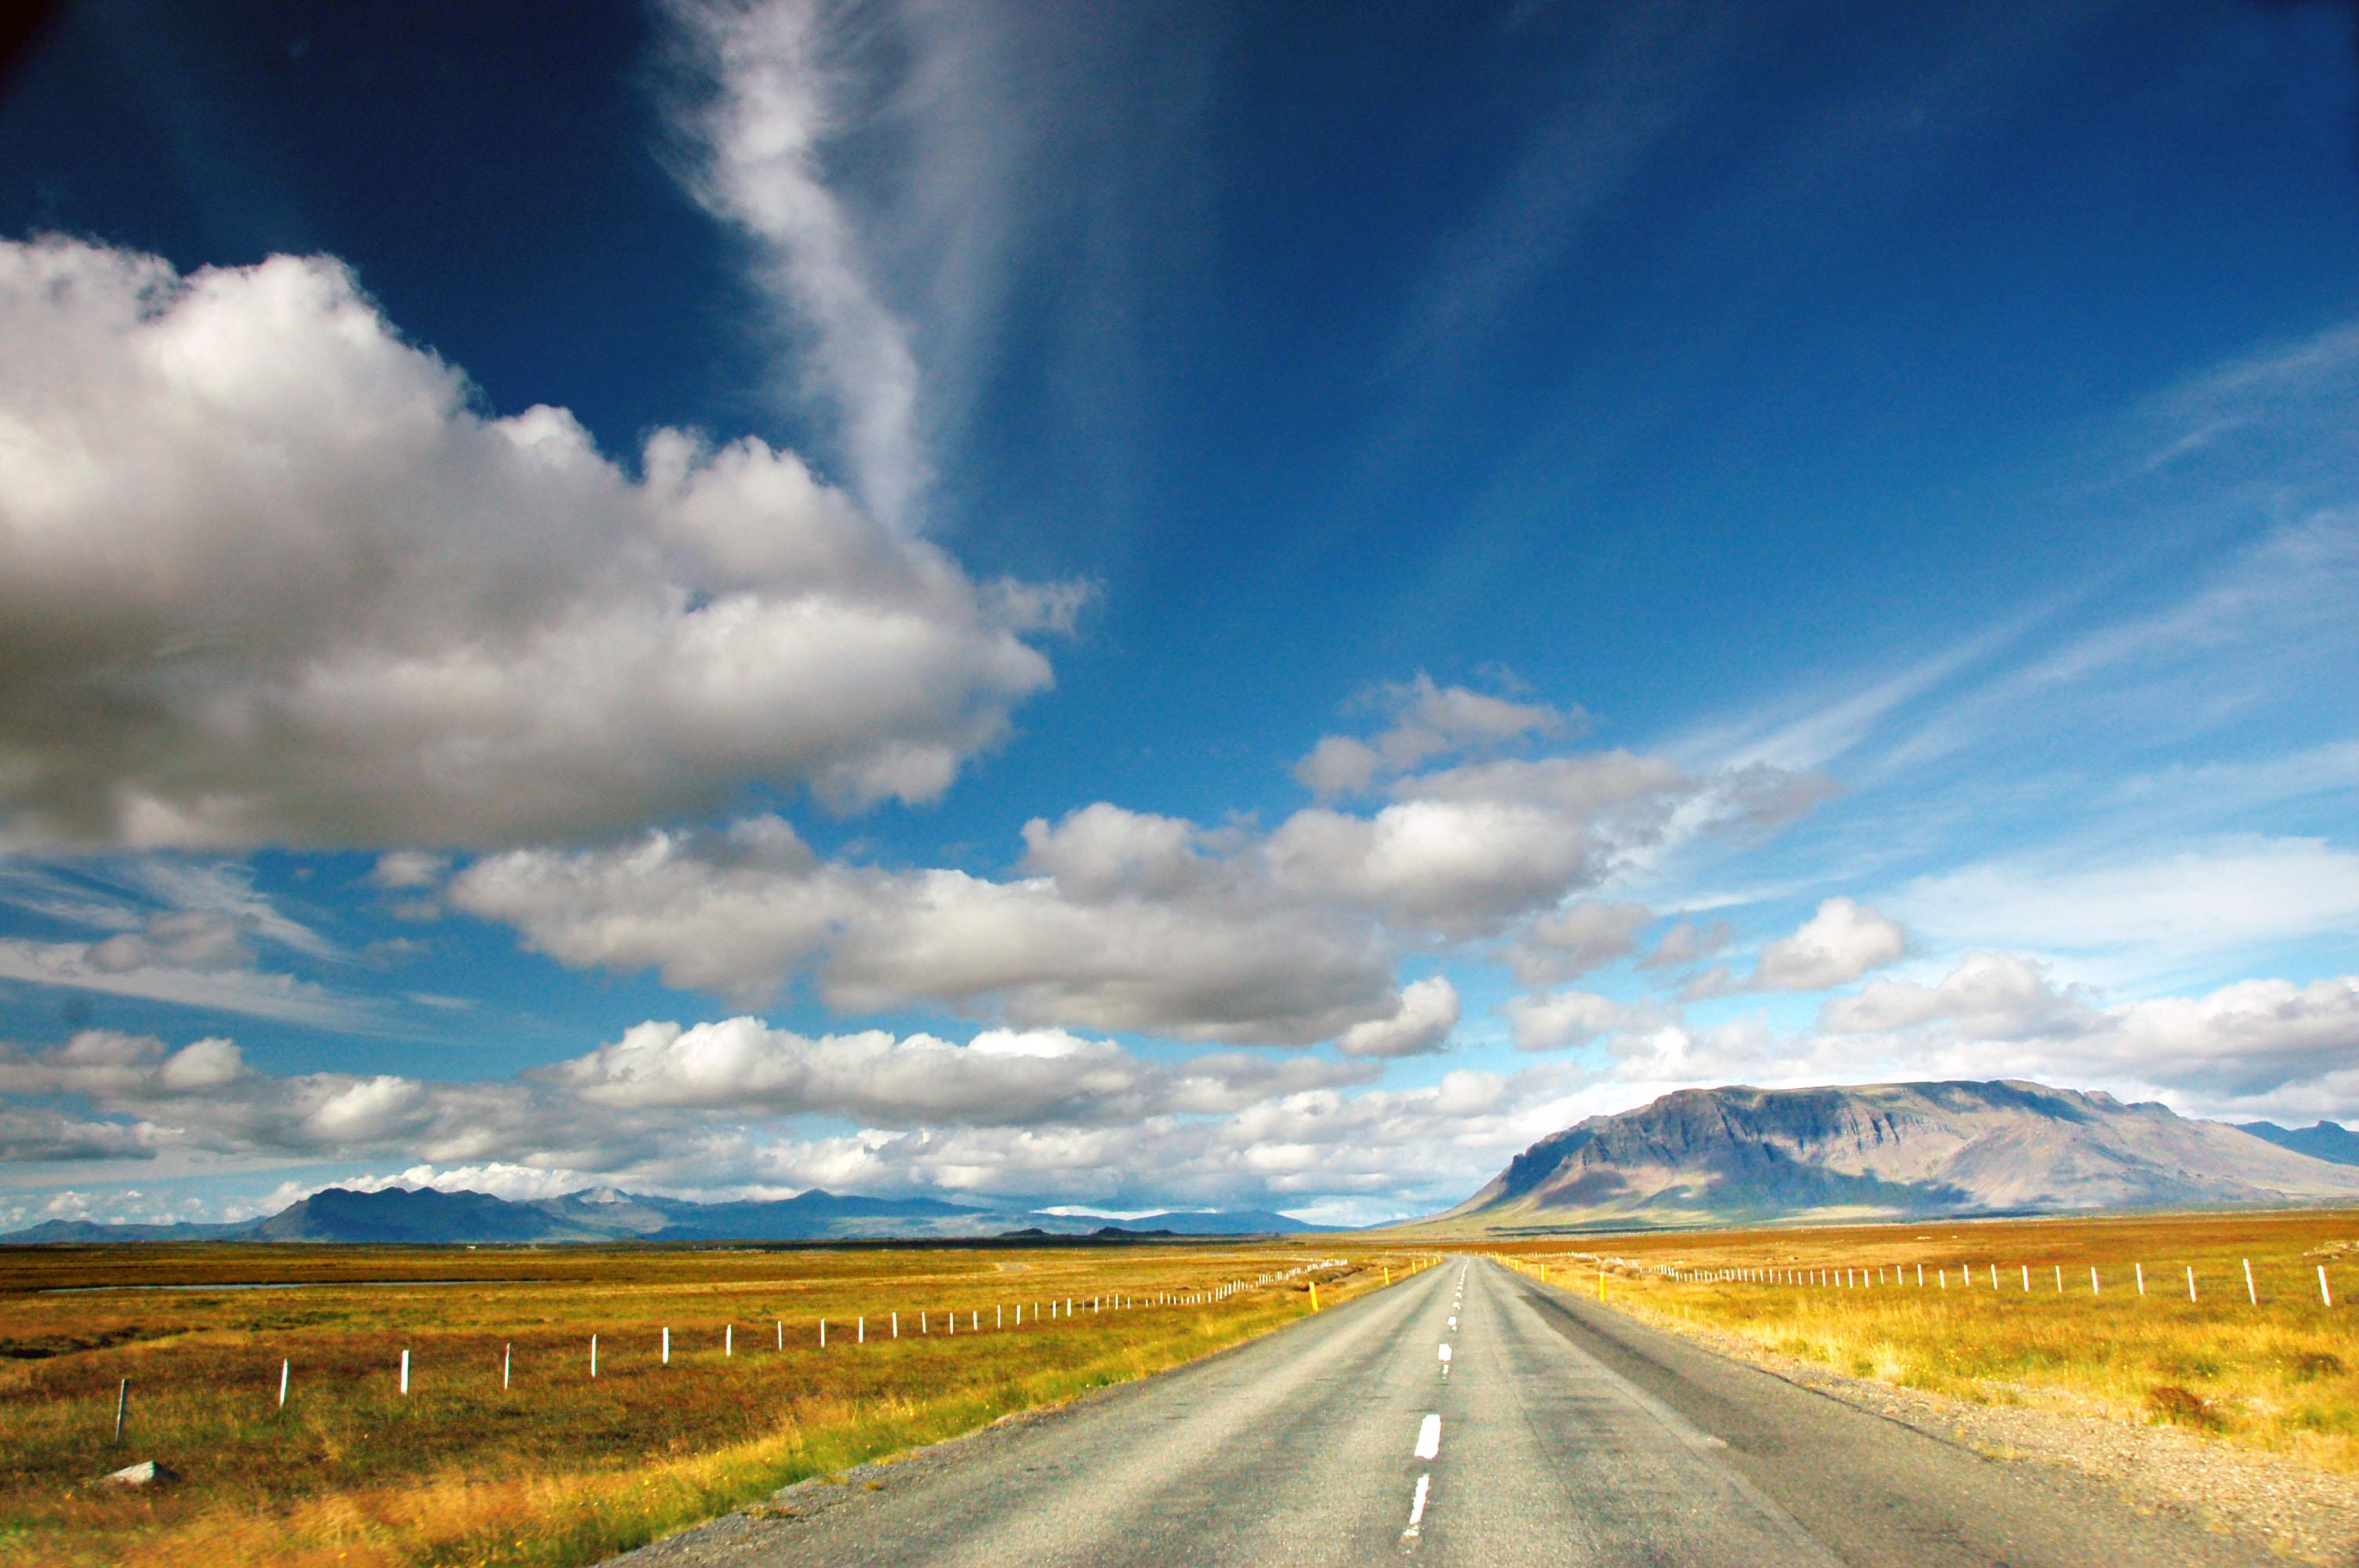 Week 8 sky replacement taylorsdiginorakalissta for Cloud wallpaper